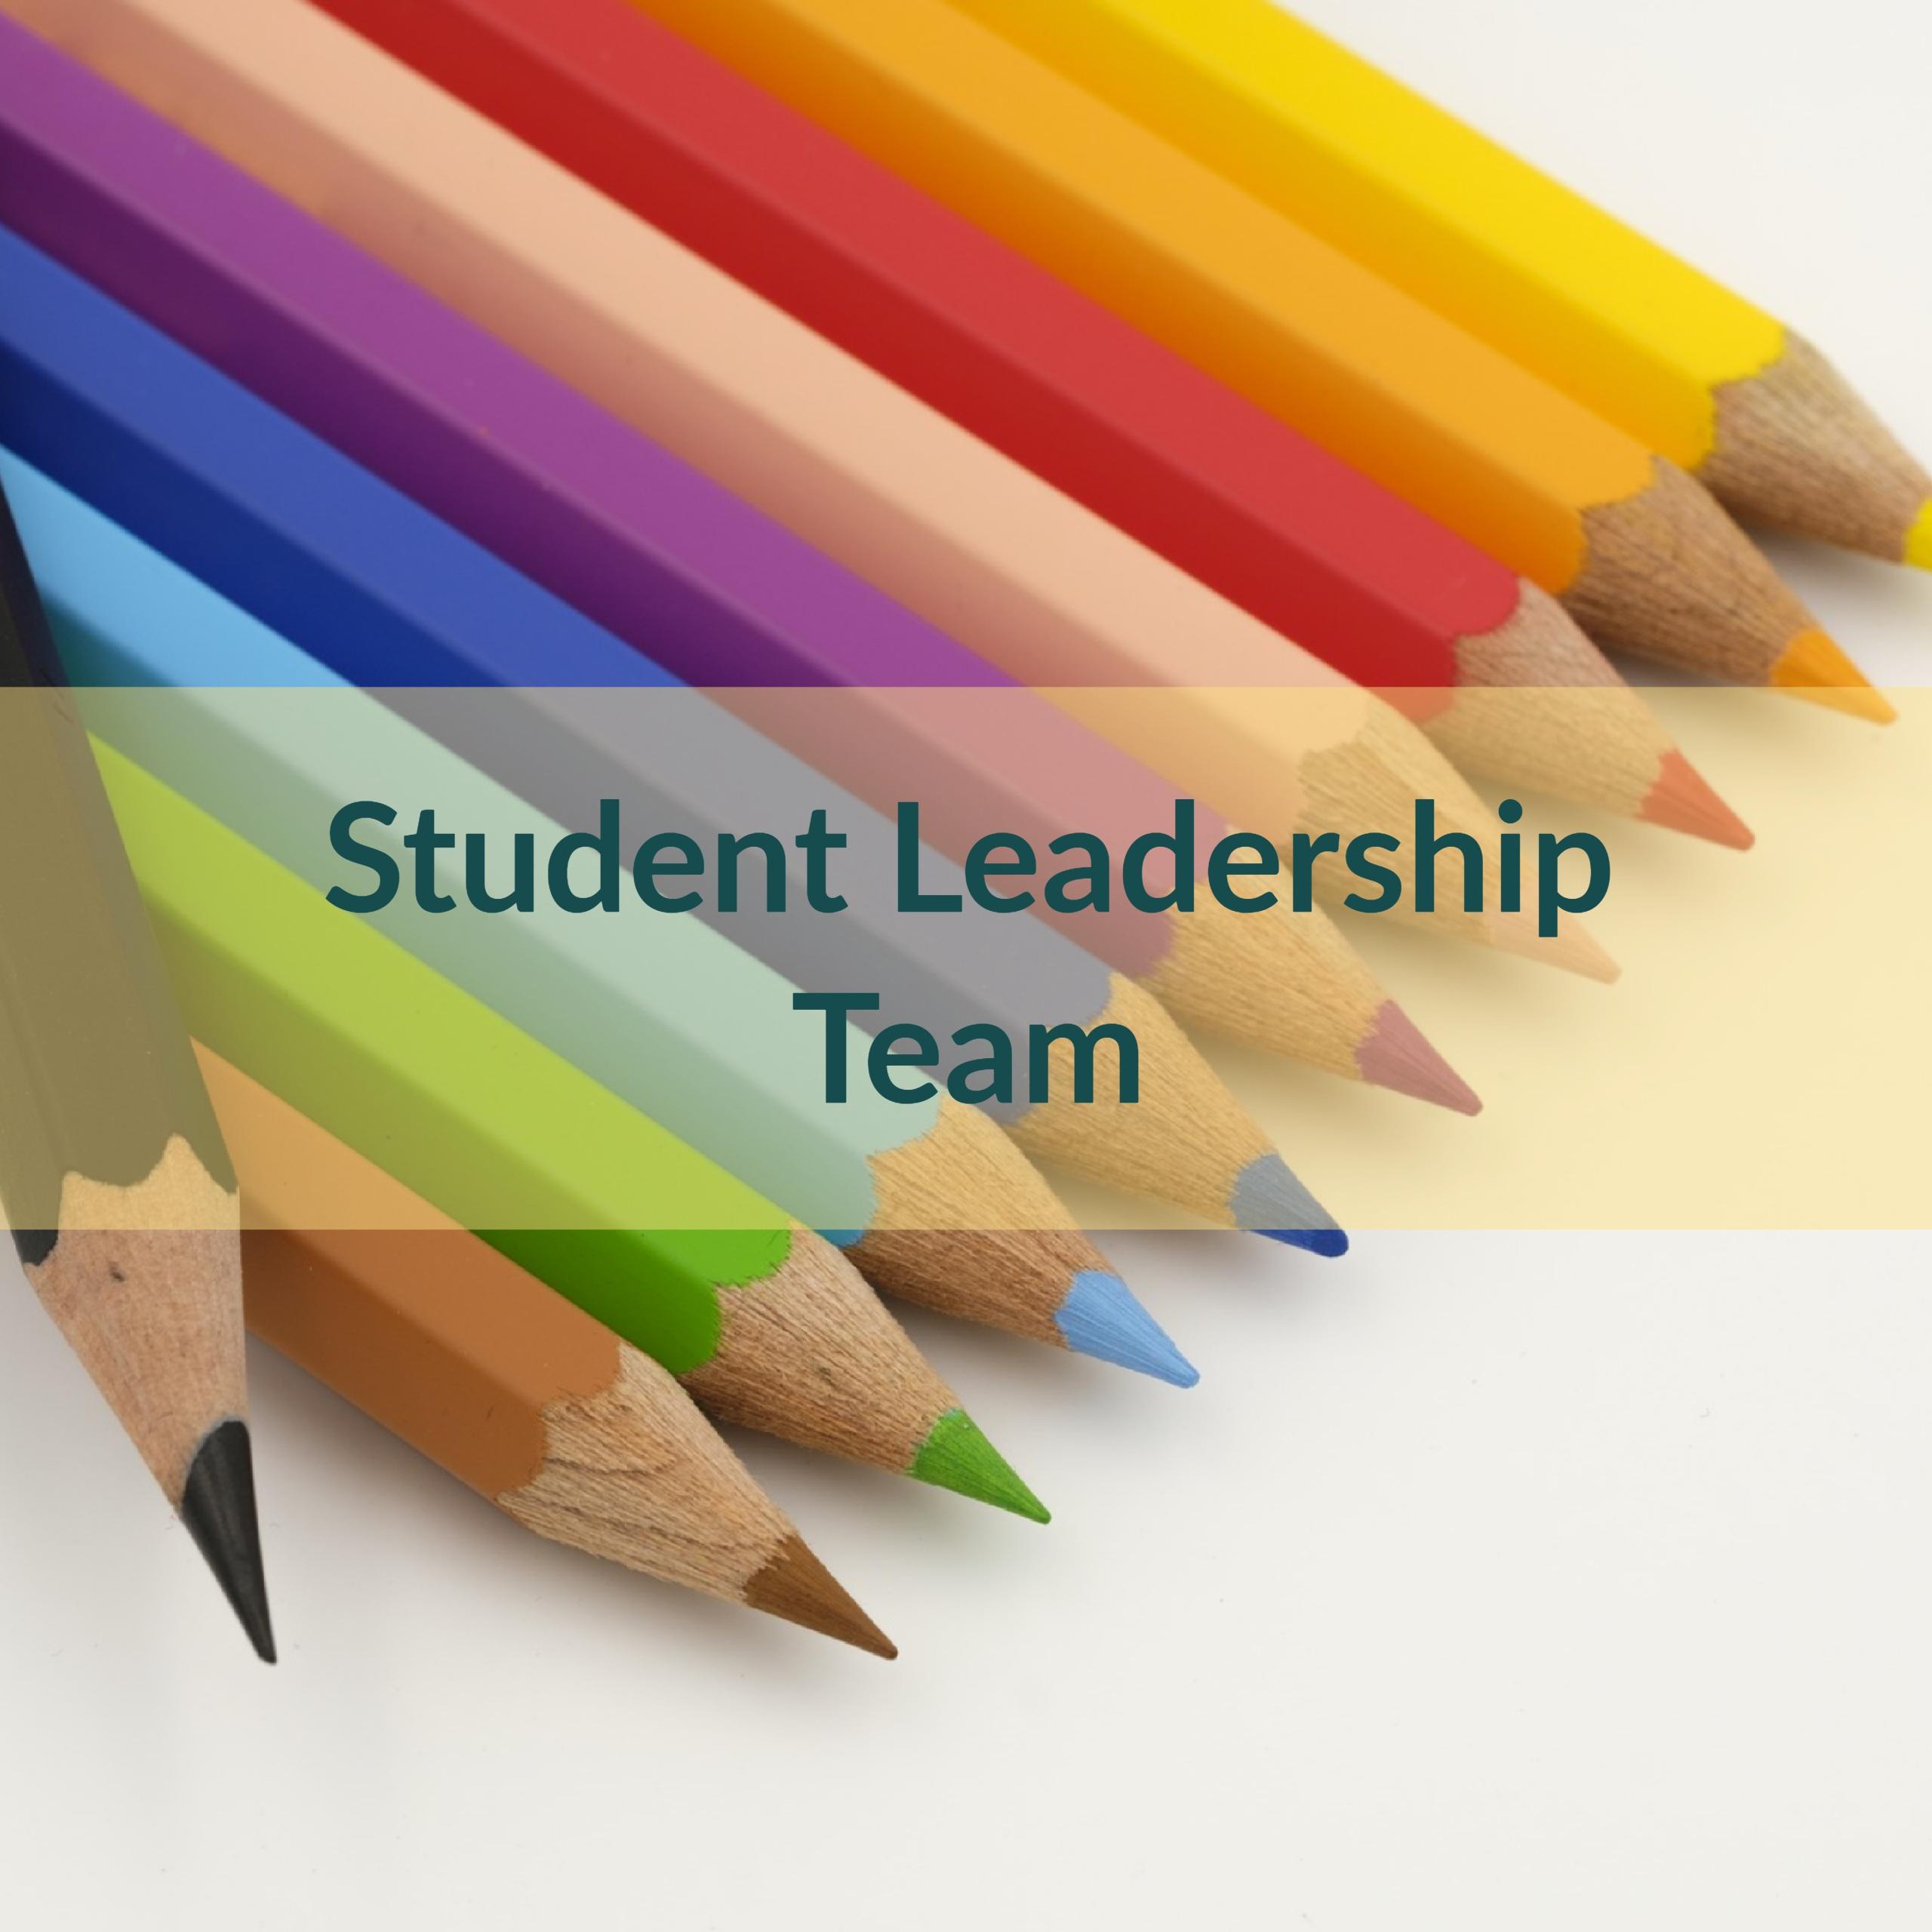 Student Leadership Team for 2018